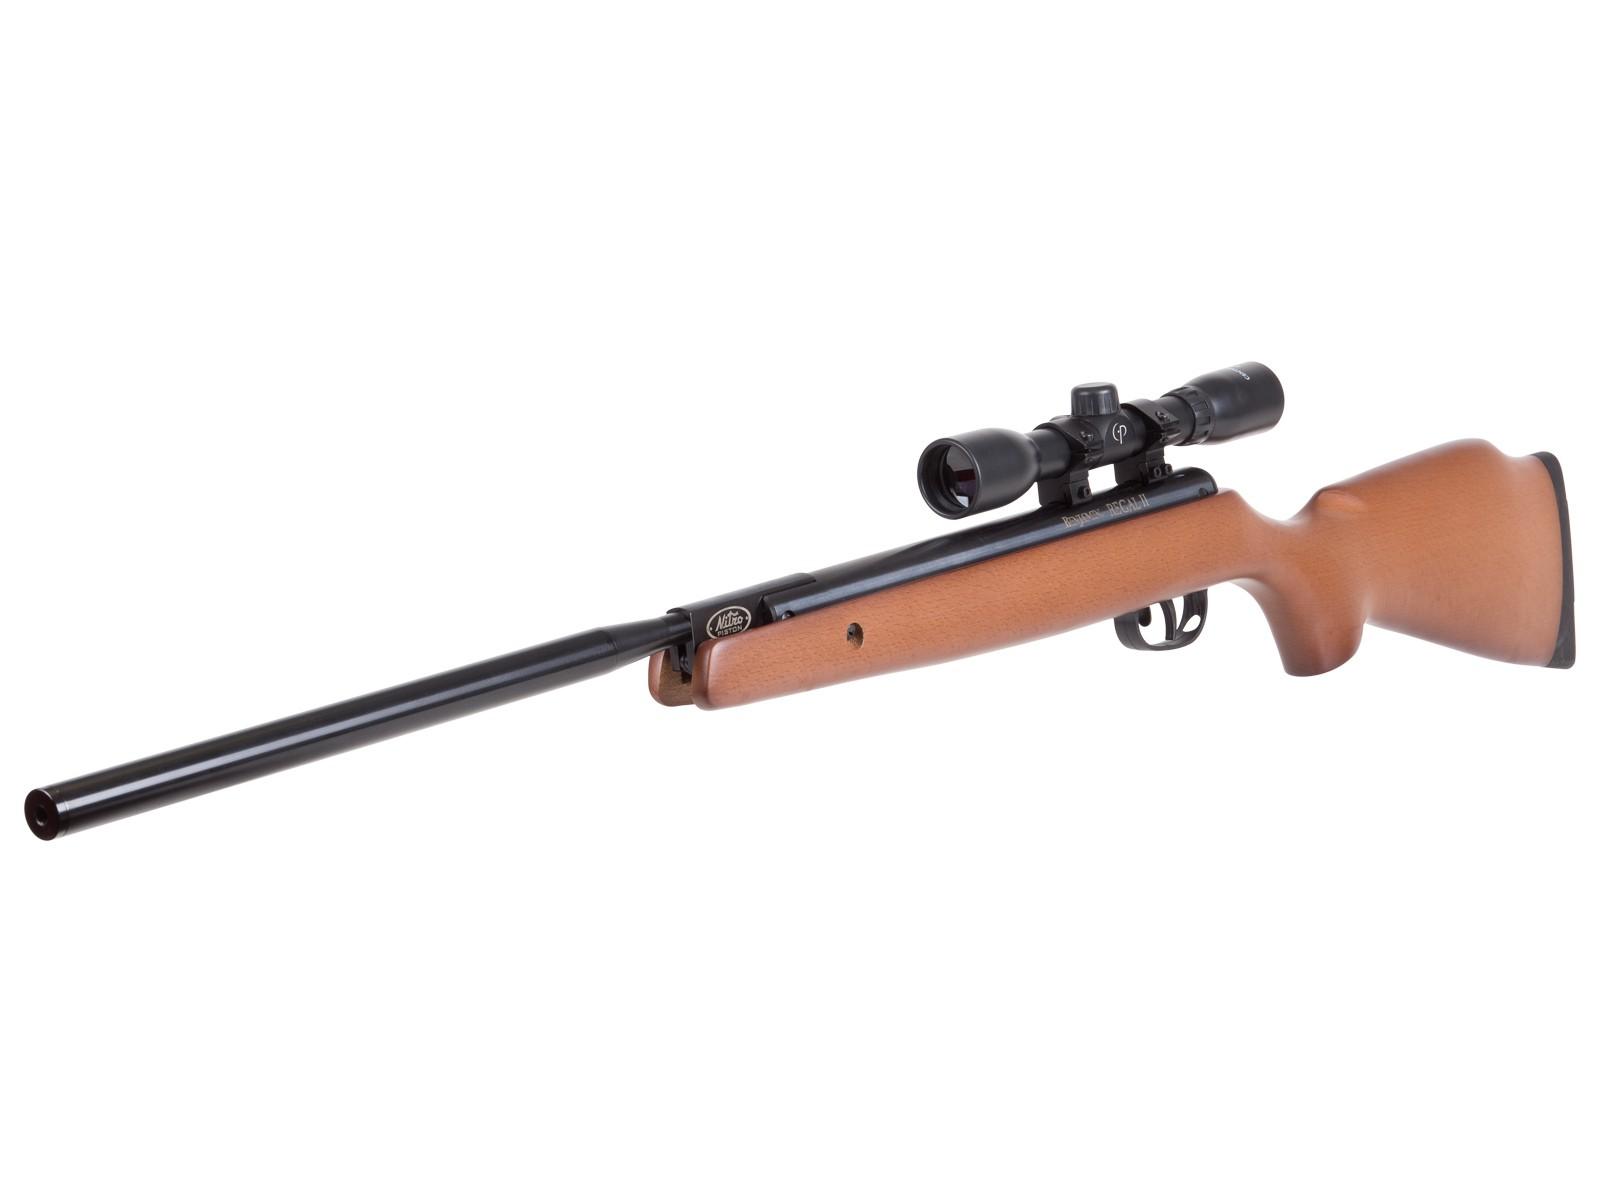 Benjamin Regal II NP Pellet Air Rifle with 4x32 Scope